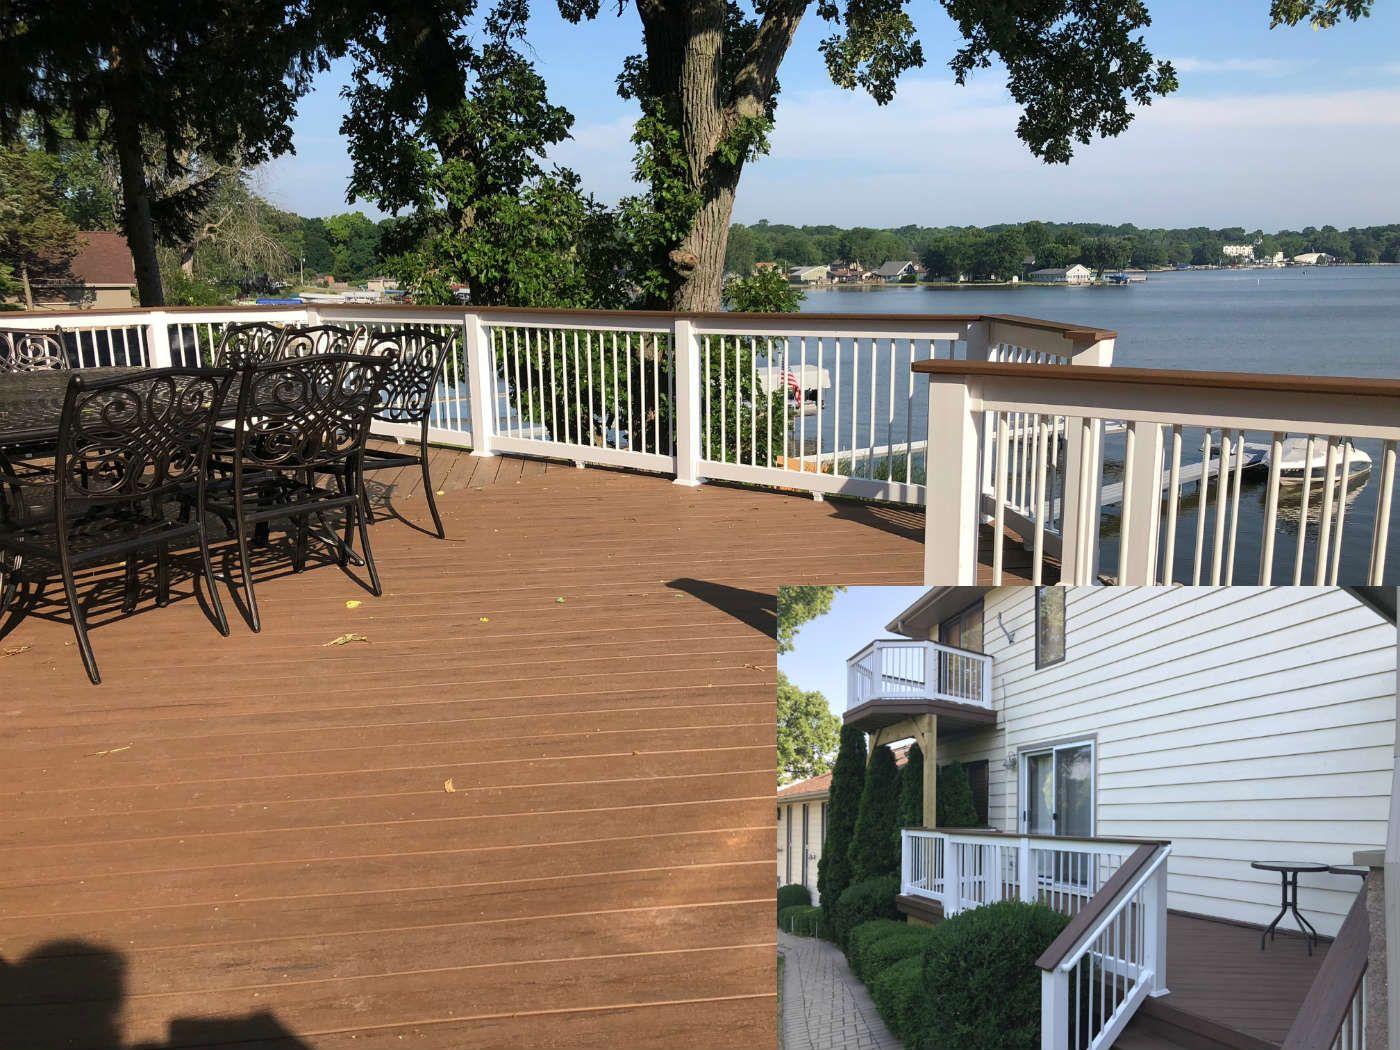 Timber Tech Deck In Brown Oak With Vinyl Railing Deck Builders Timbertech Deck